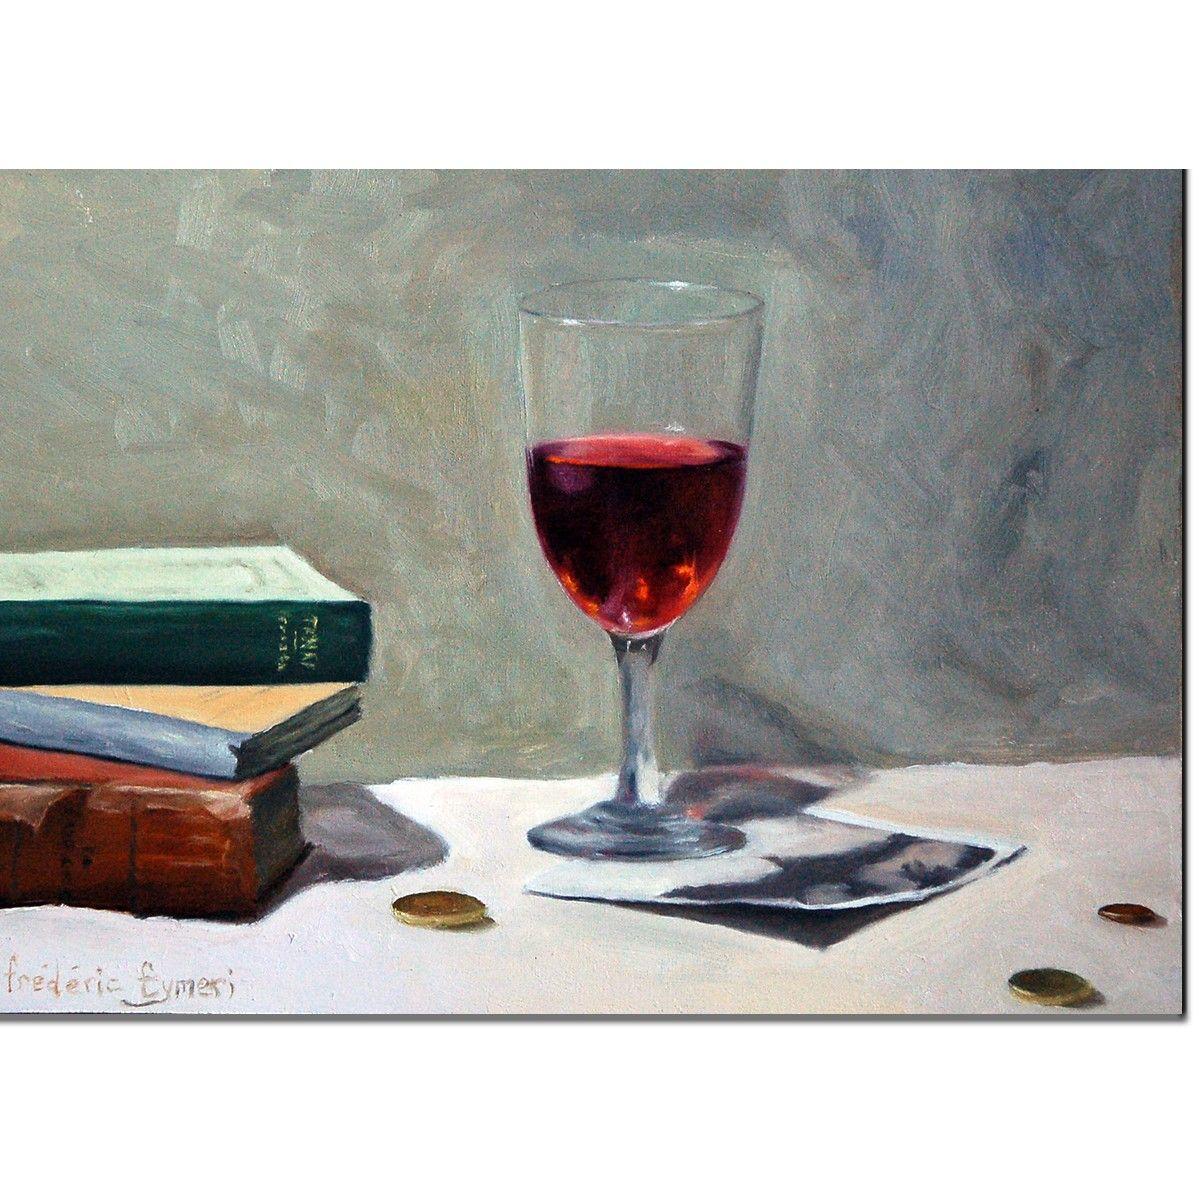 Le verre de vin http://www.fredericeymeri.